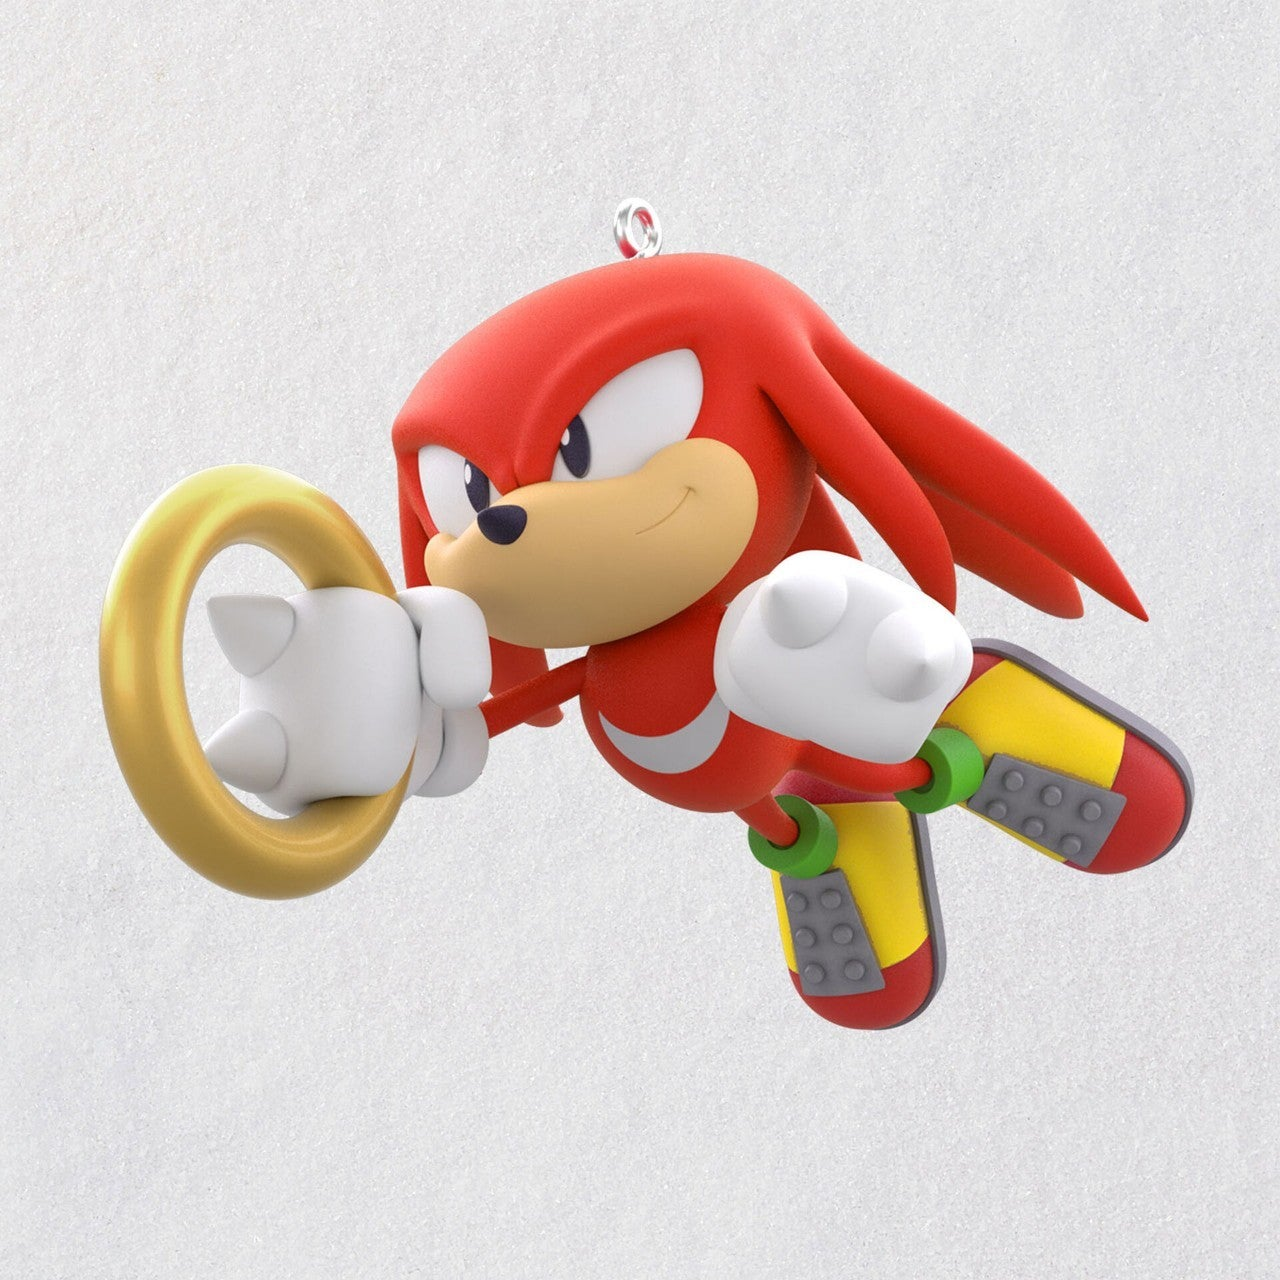 Sonic-the-Hedgehog-Knuckles-Keepsake-Ornament_1799QXE3262_01